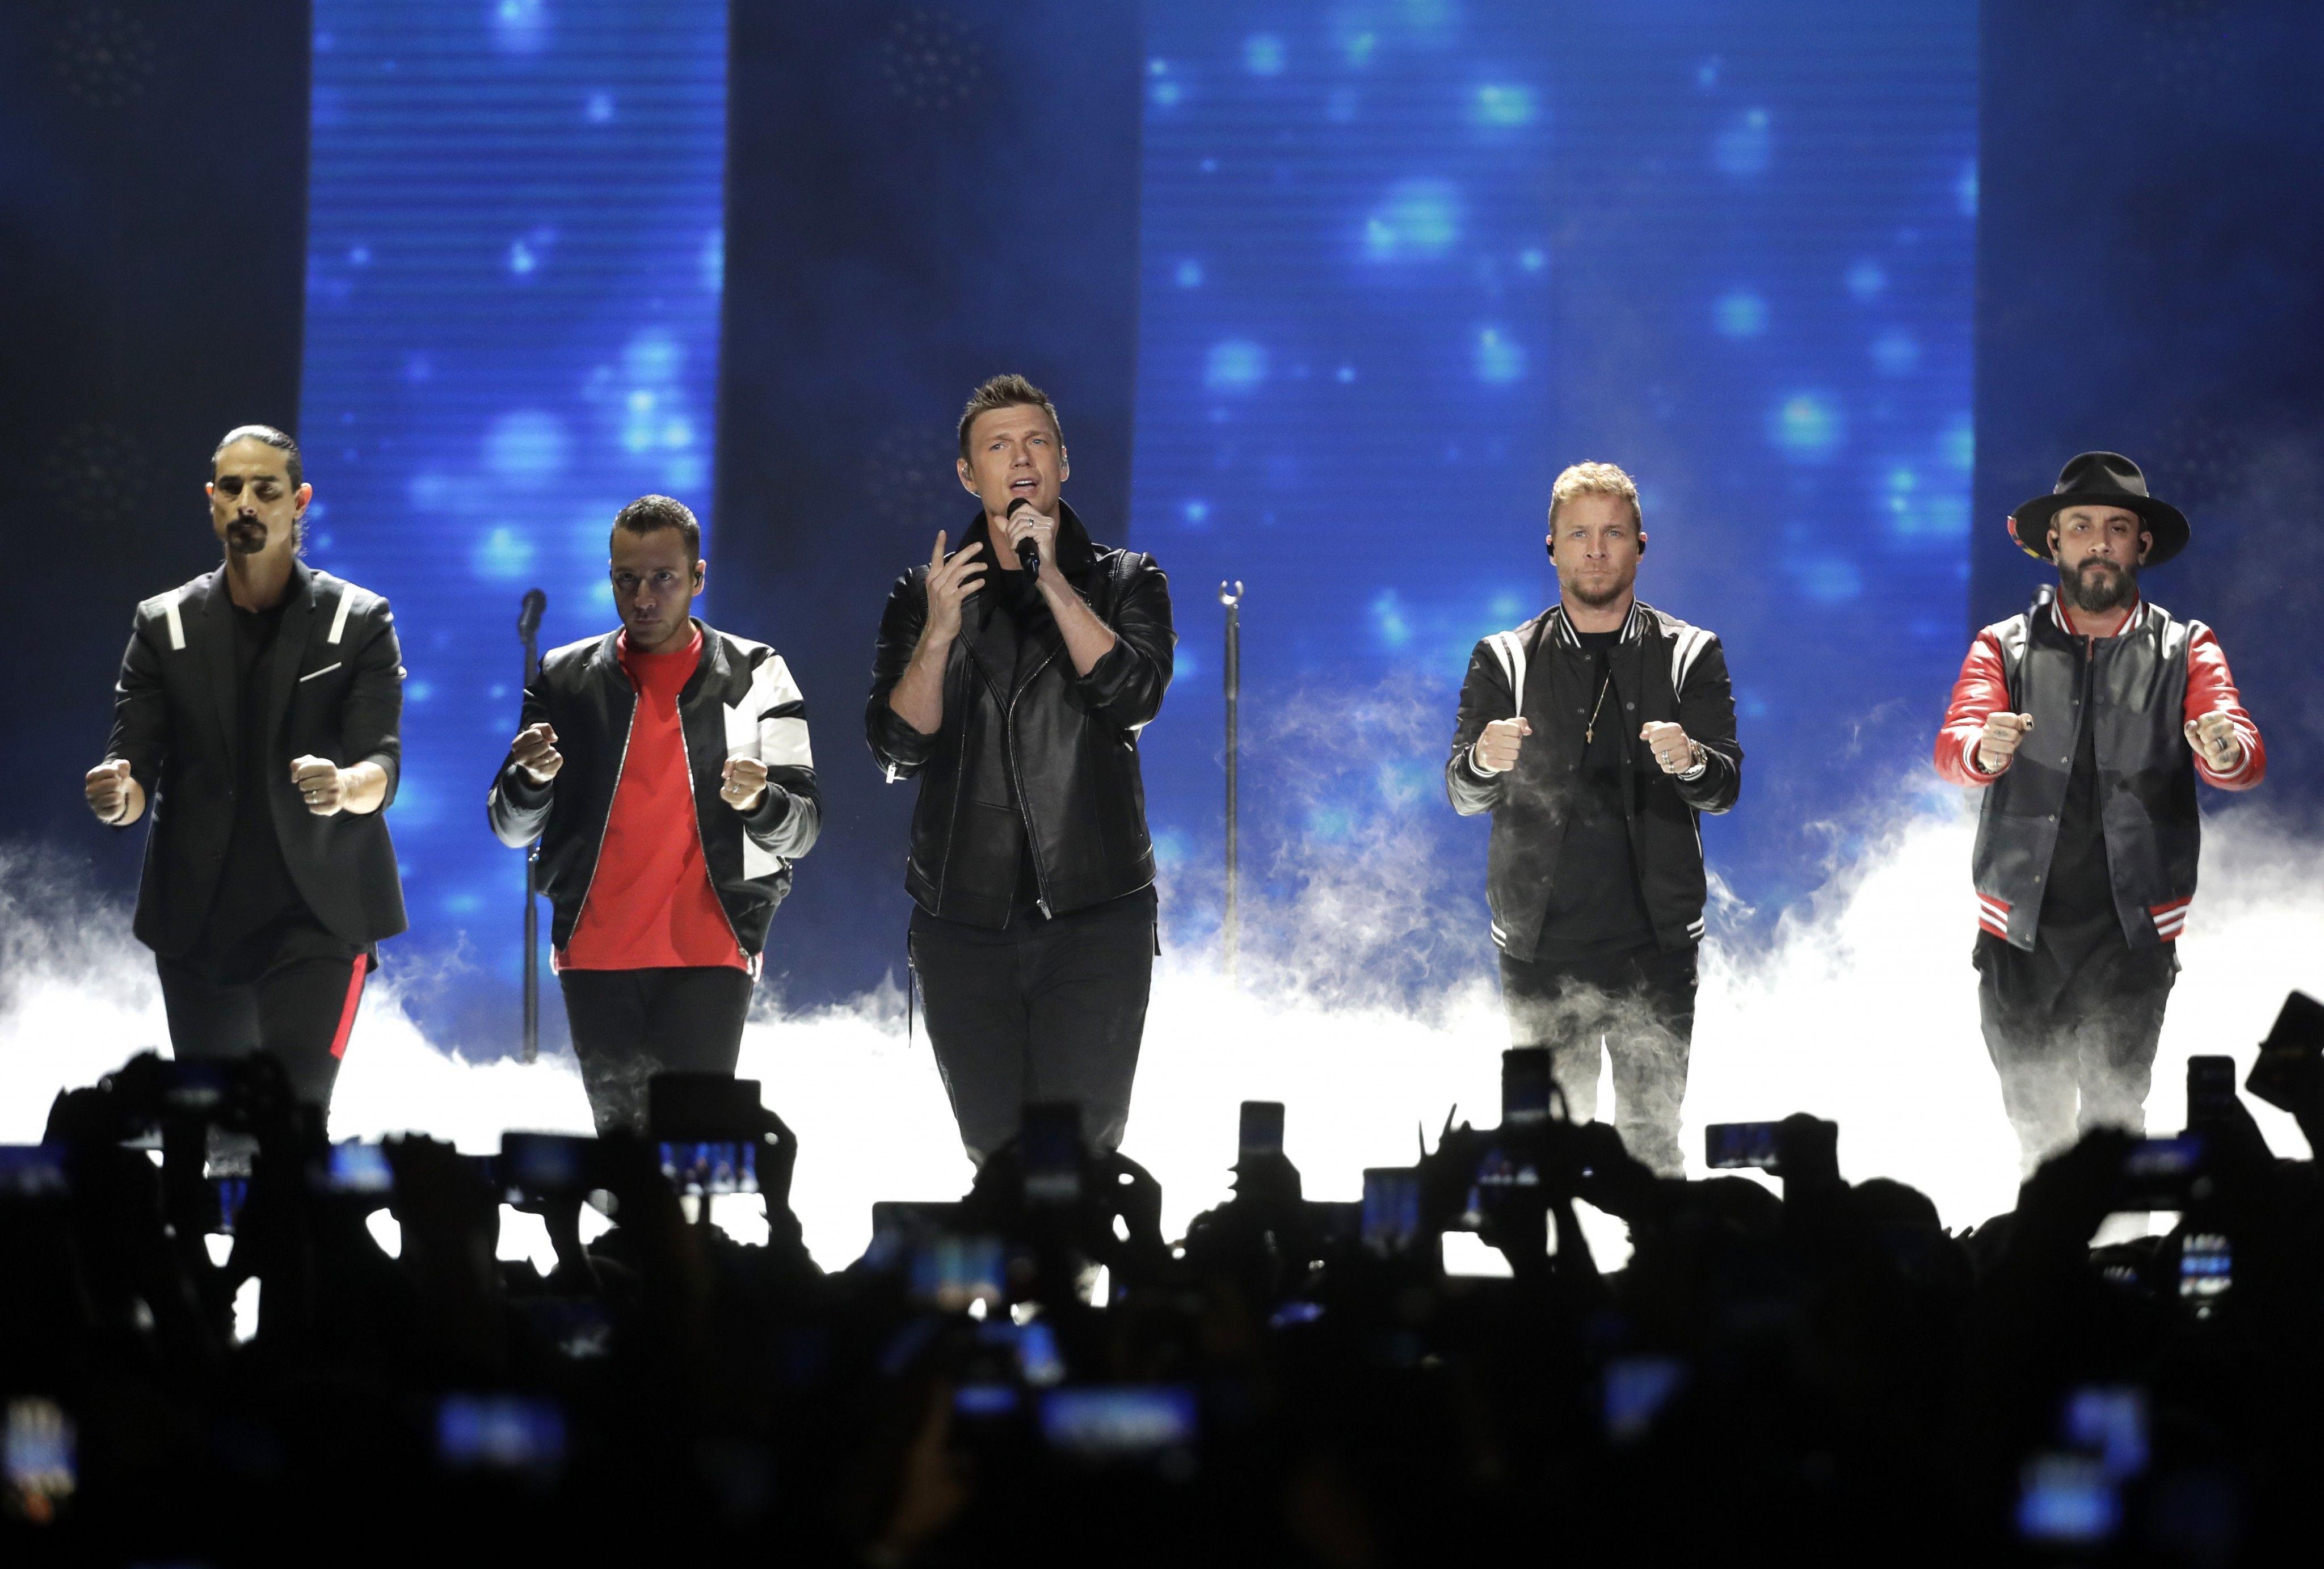 Backstreet Boys gastieren 2019 in der Wiener Stadthalle